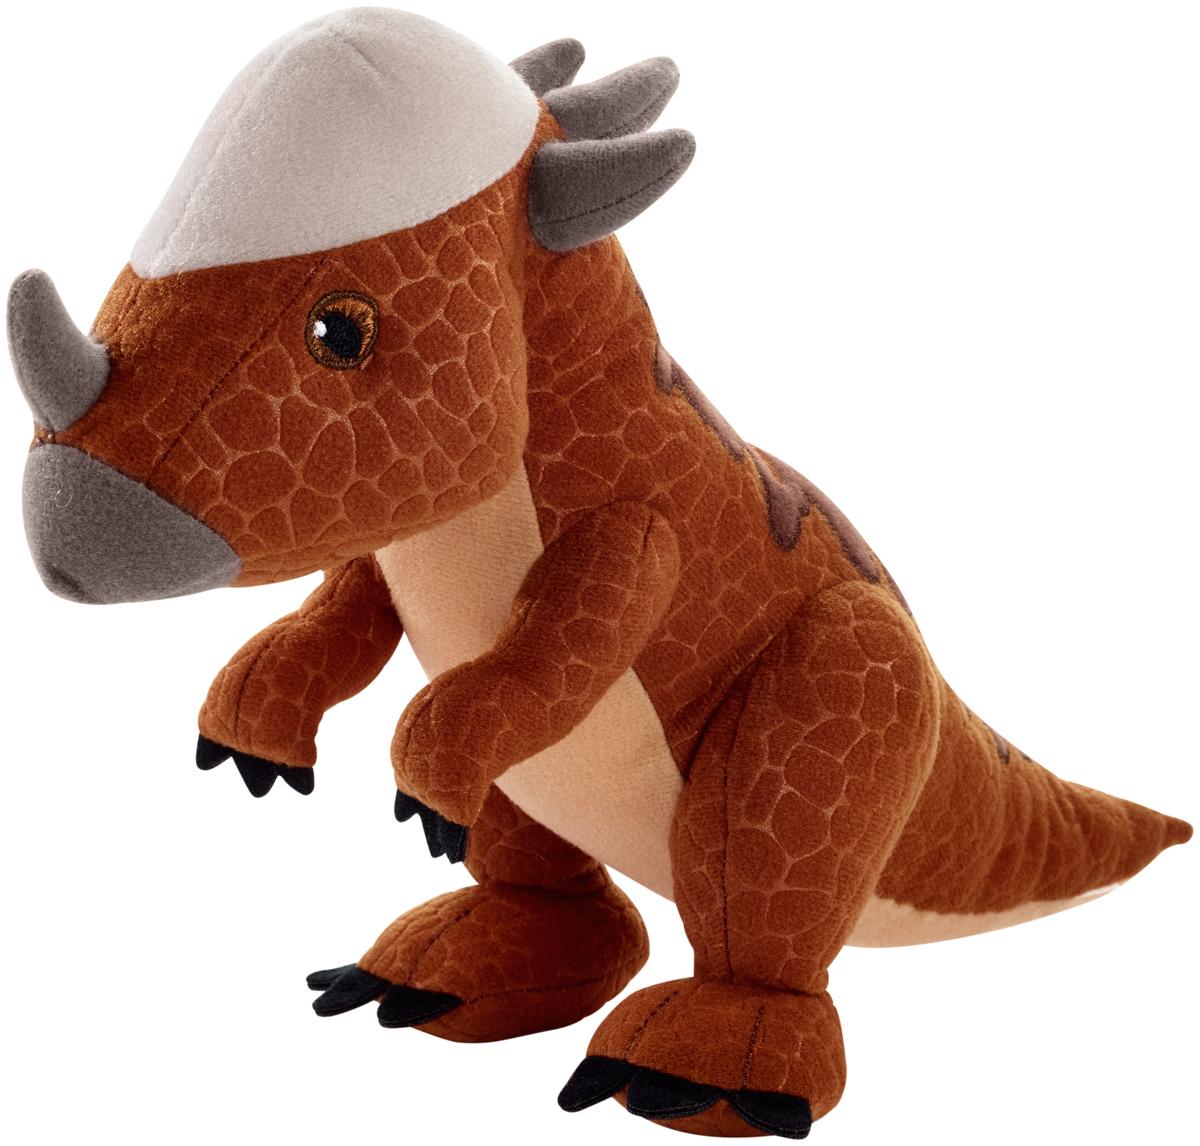 Jurassic World Мягкая игрушка Динозавр Stygimoloch Stiggy 18 см imaginext интерактивная игрушка jurassic world гигантский роботизированнй динозавр